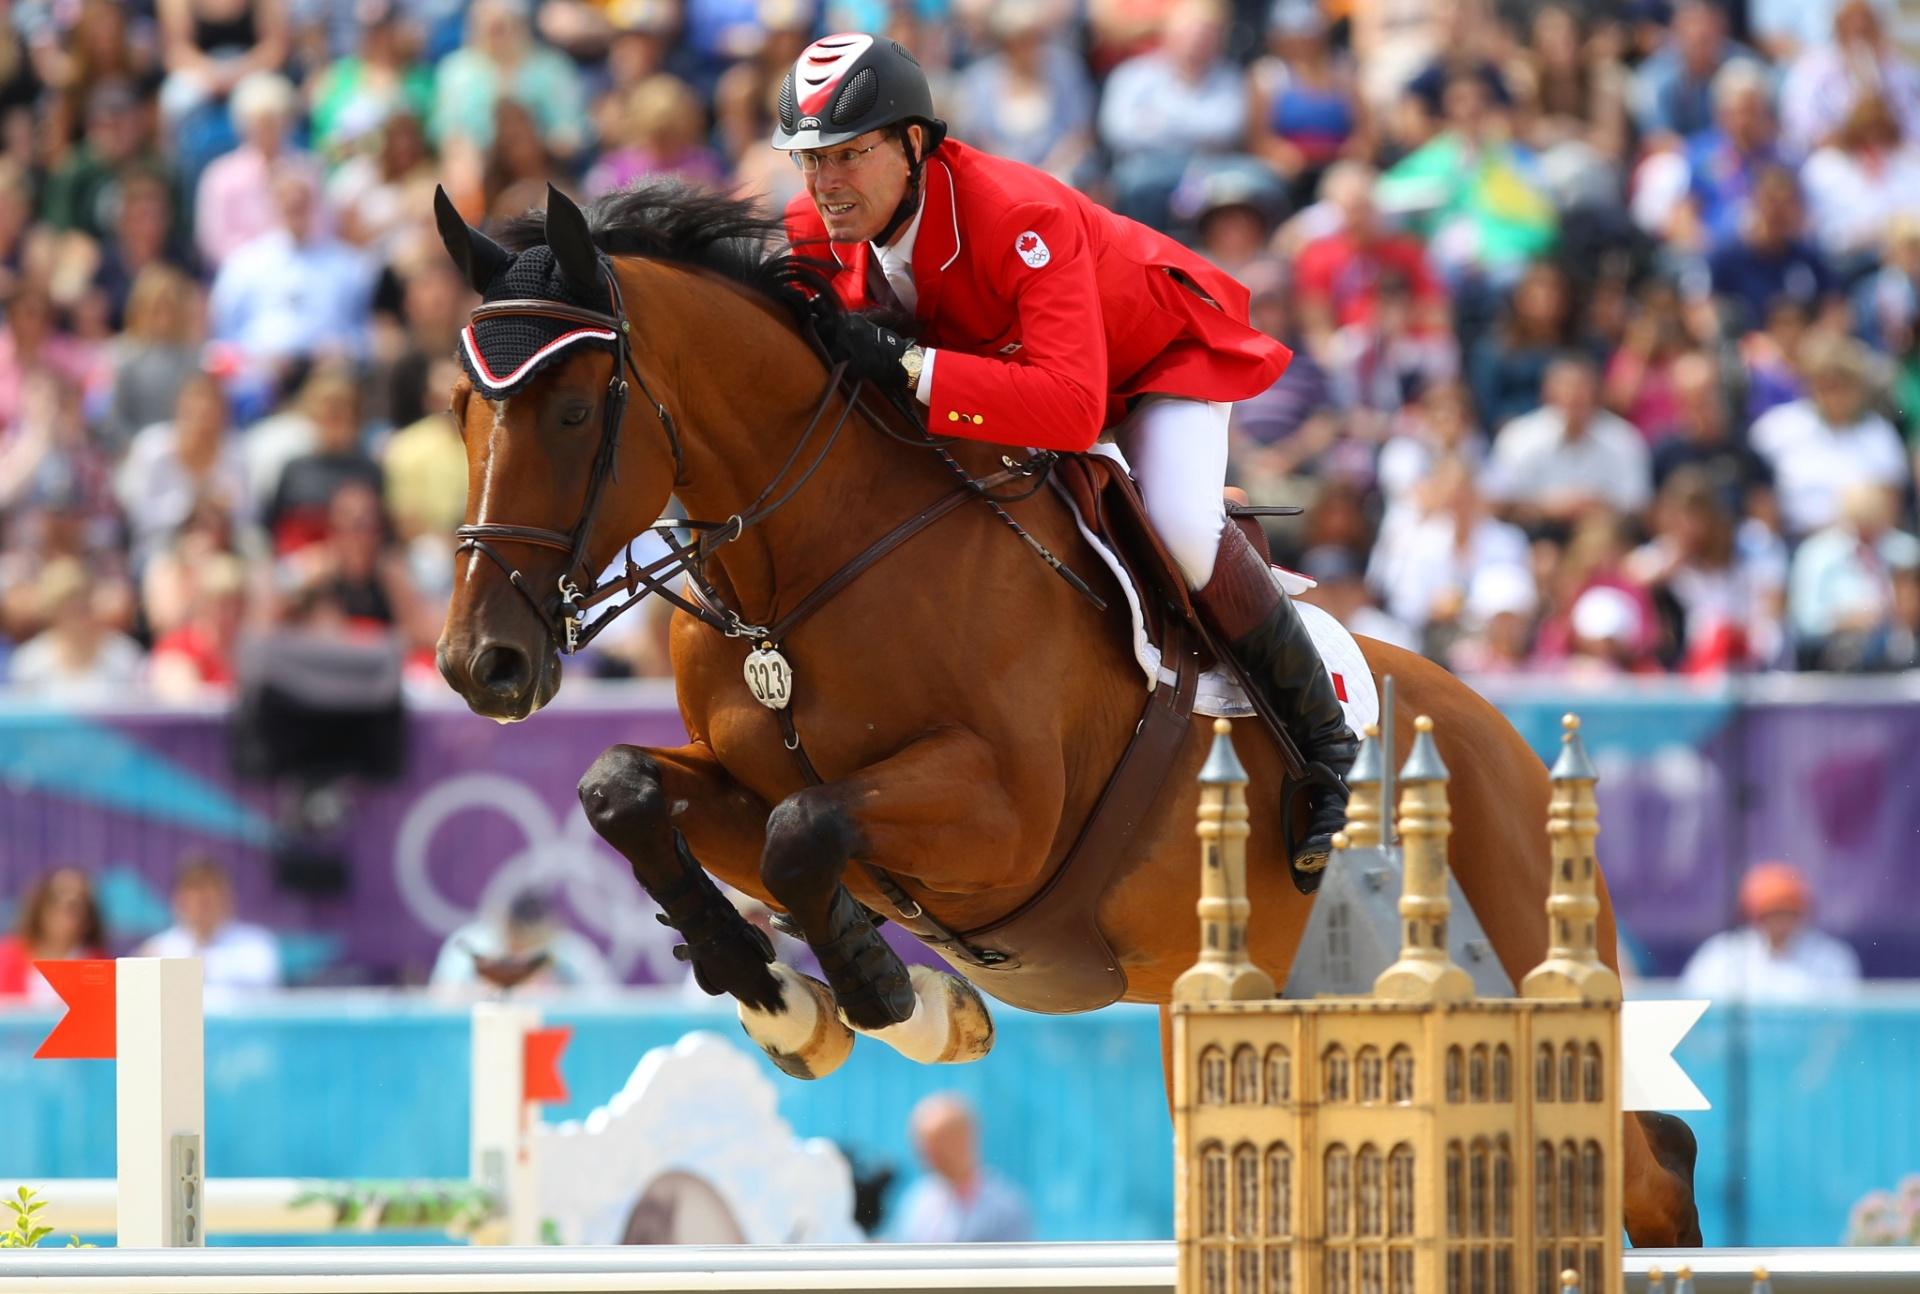 08.ago.2012 - Ian Millar se apresenta na prova de saltos do hipismo durante os Jogos Olímpicos de Londres